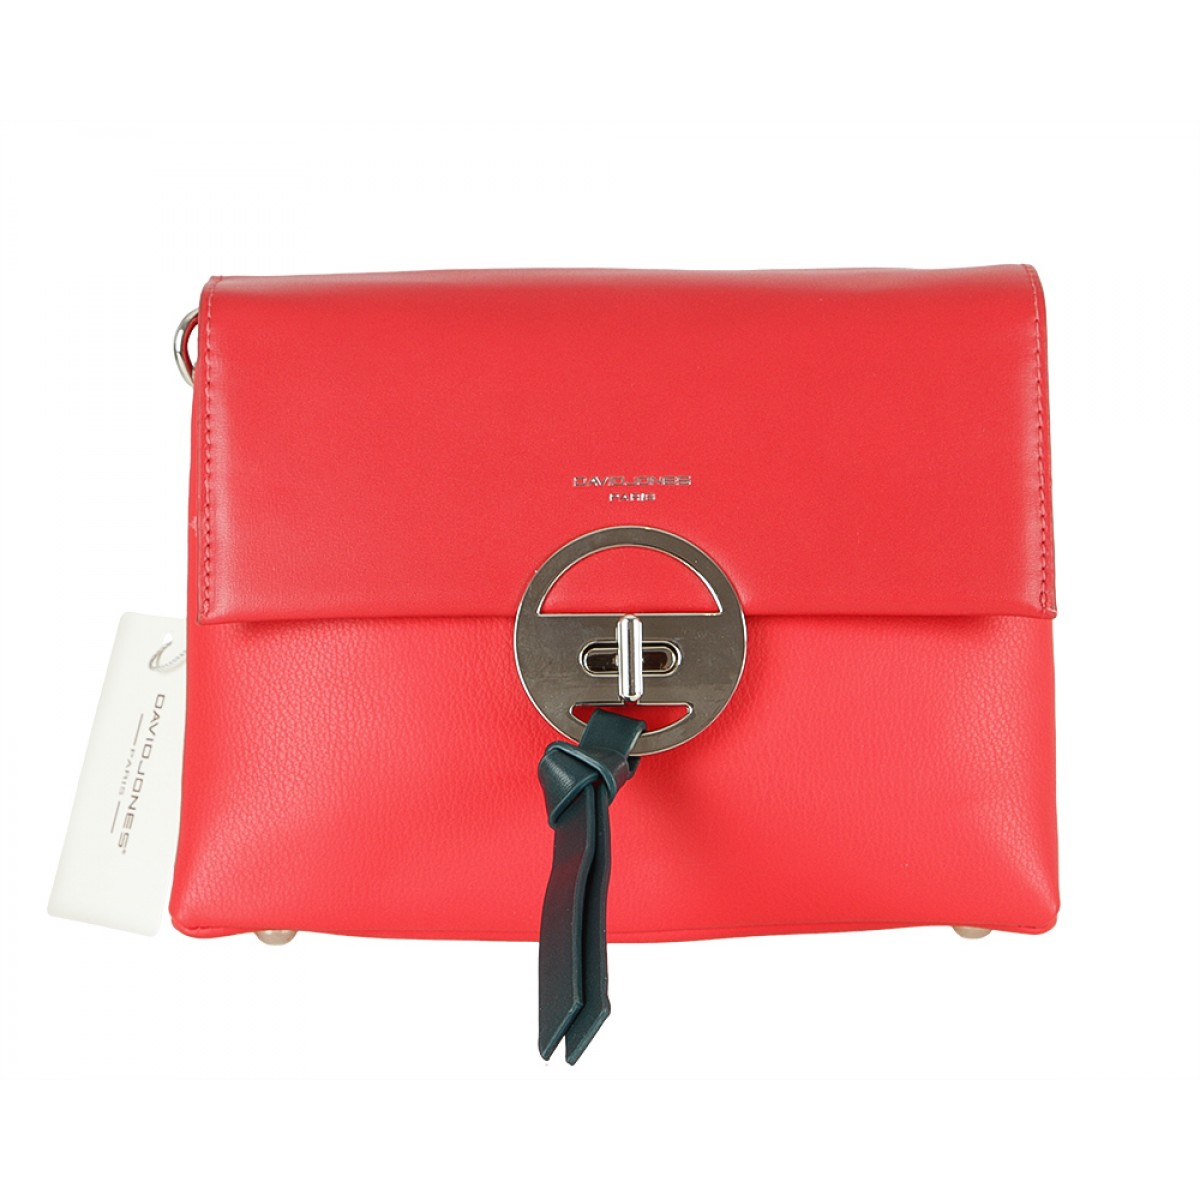 Жіноча сумка David Jones 6213-1 RED